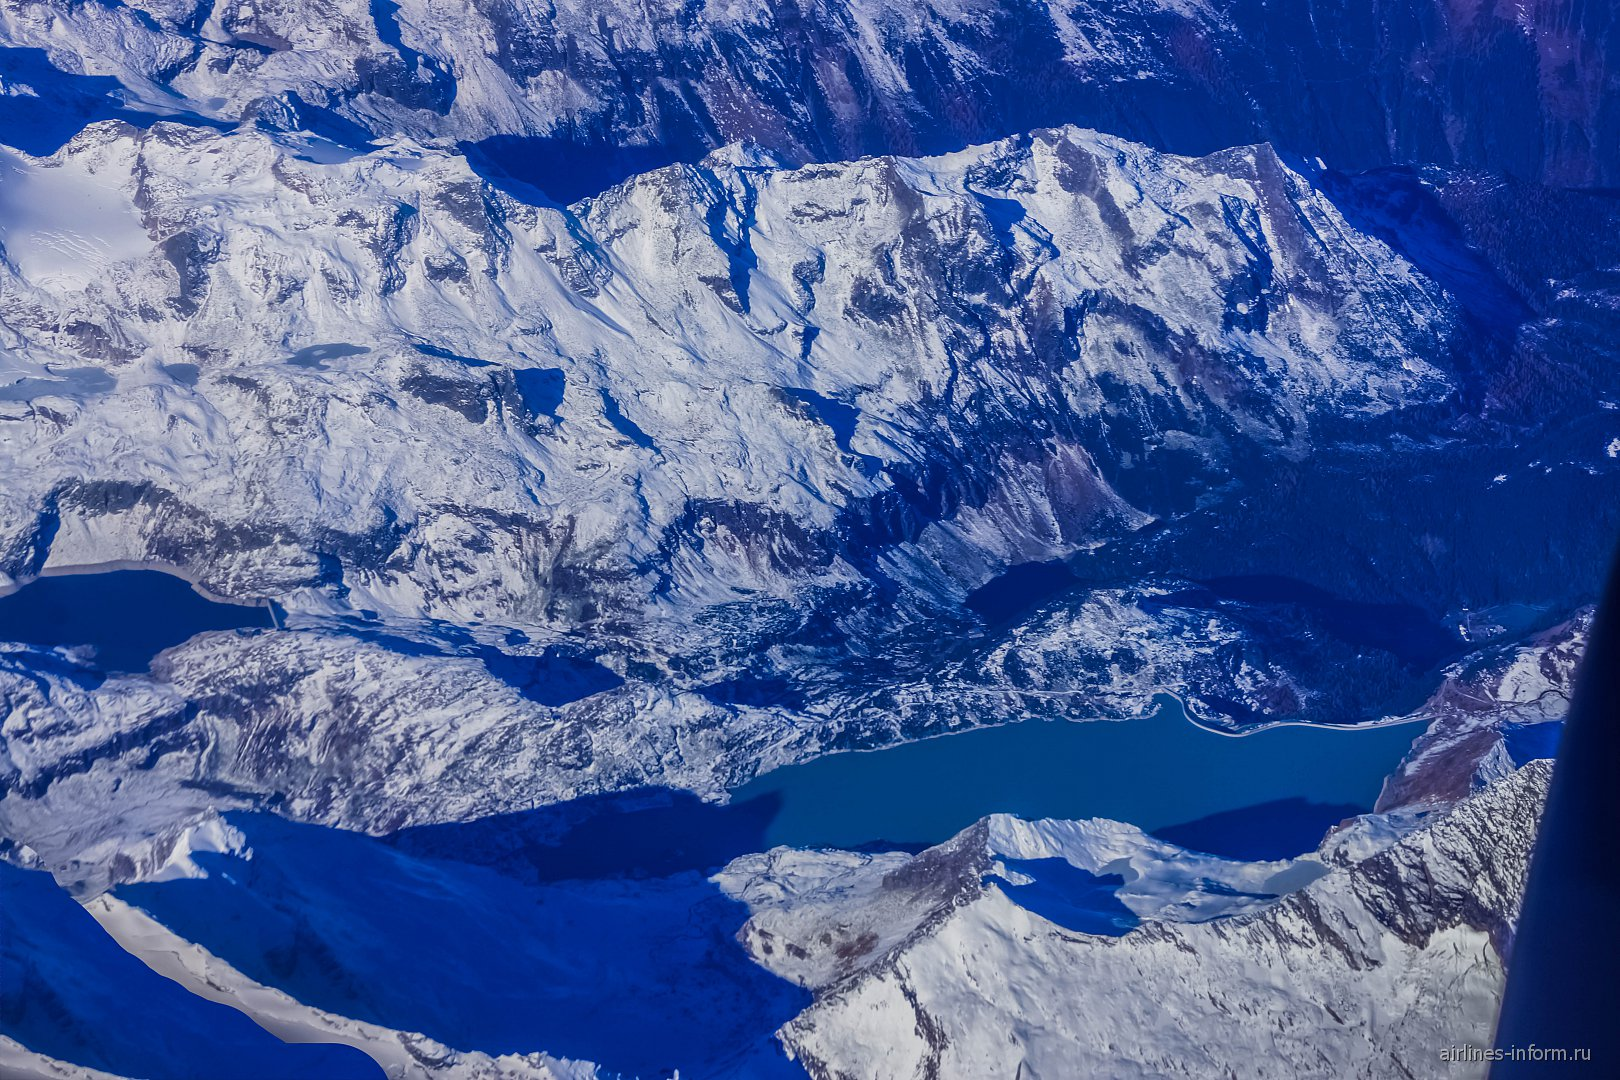 В полете над Альпами в Австрии